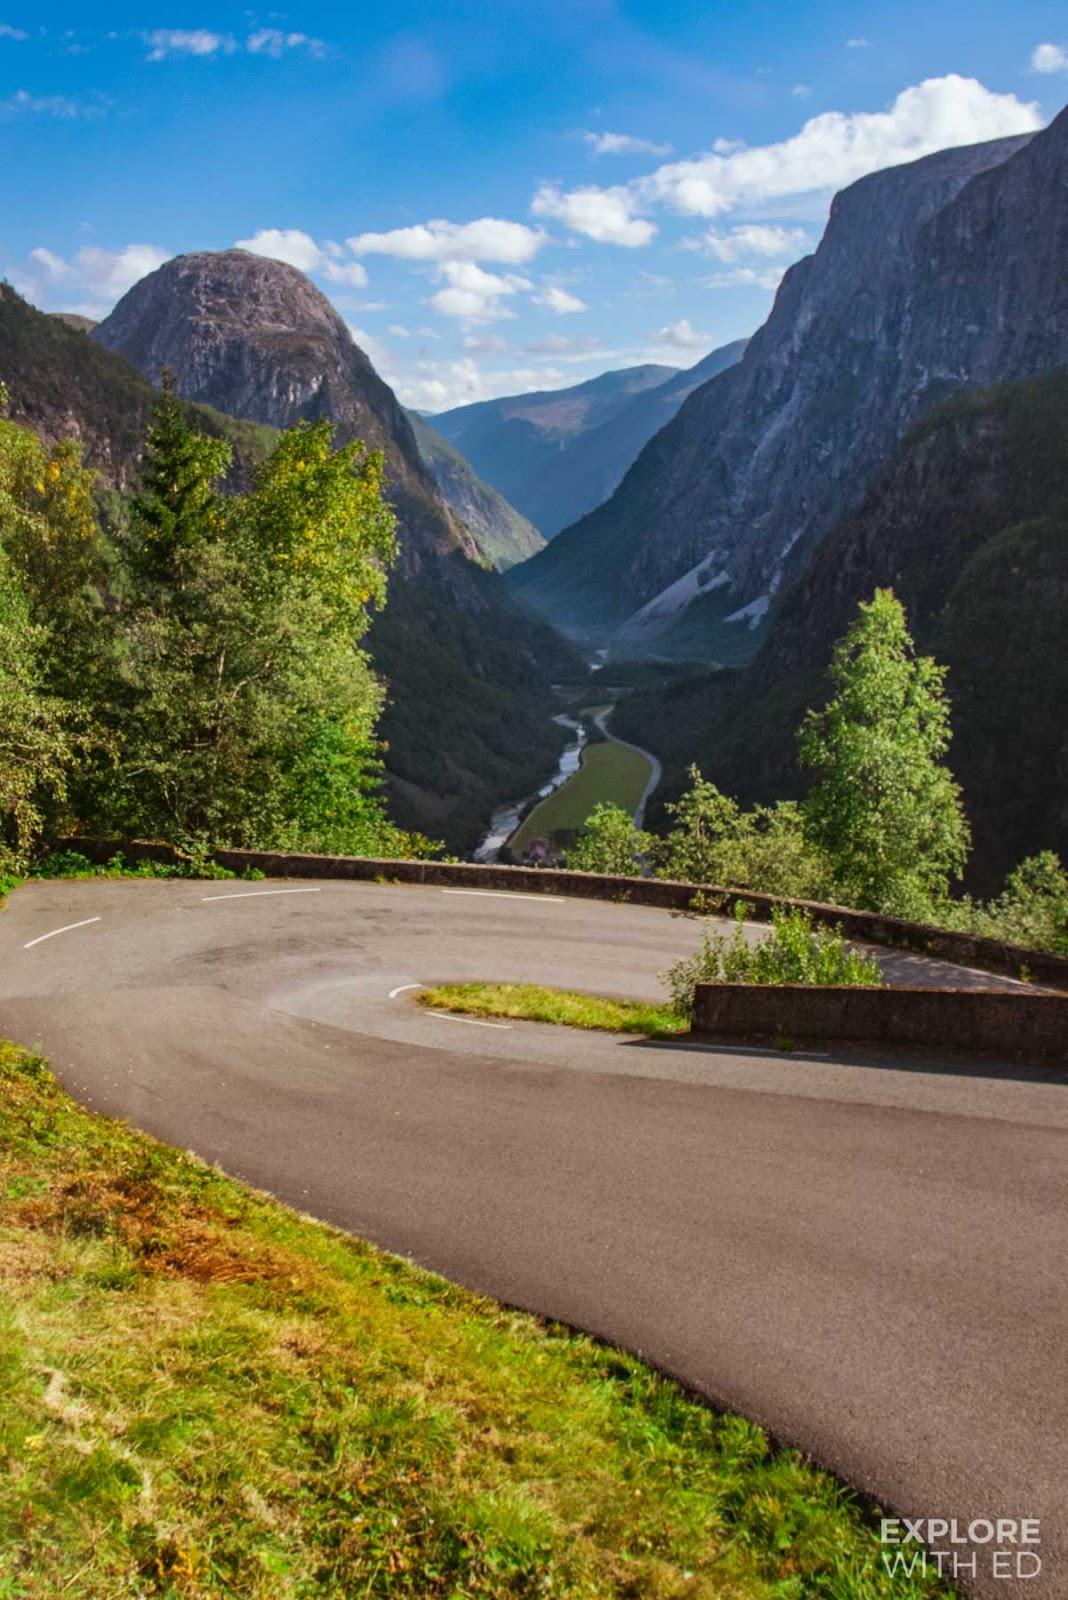 The Stalheimskleiva, Norway's steepest road, World's most dangerous roads